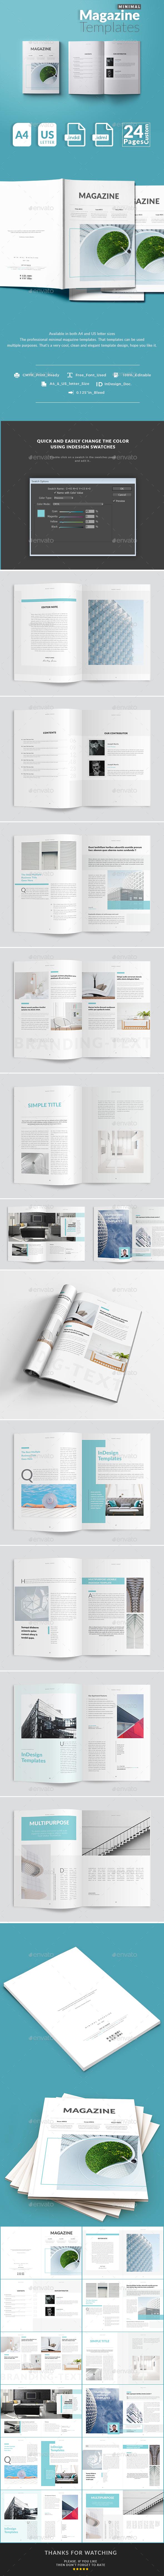 Minimal Magazine Templates - Magazines Print Templates